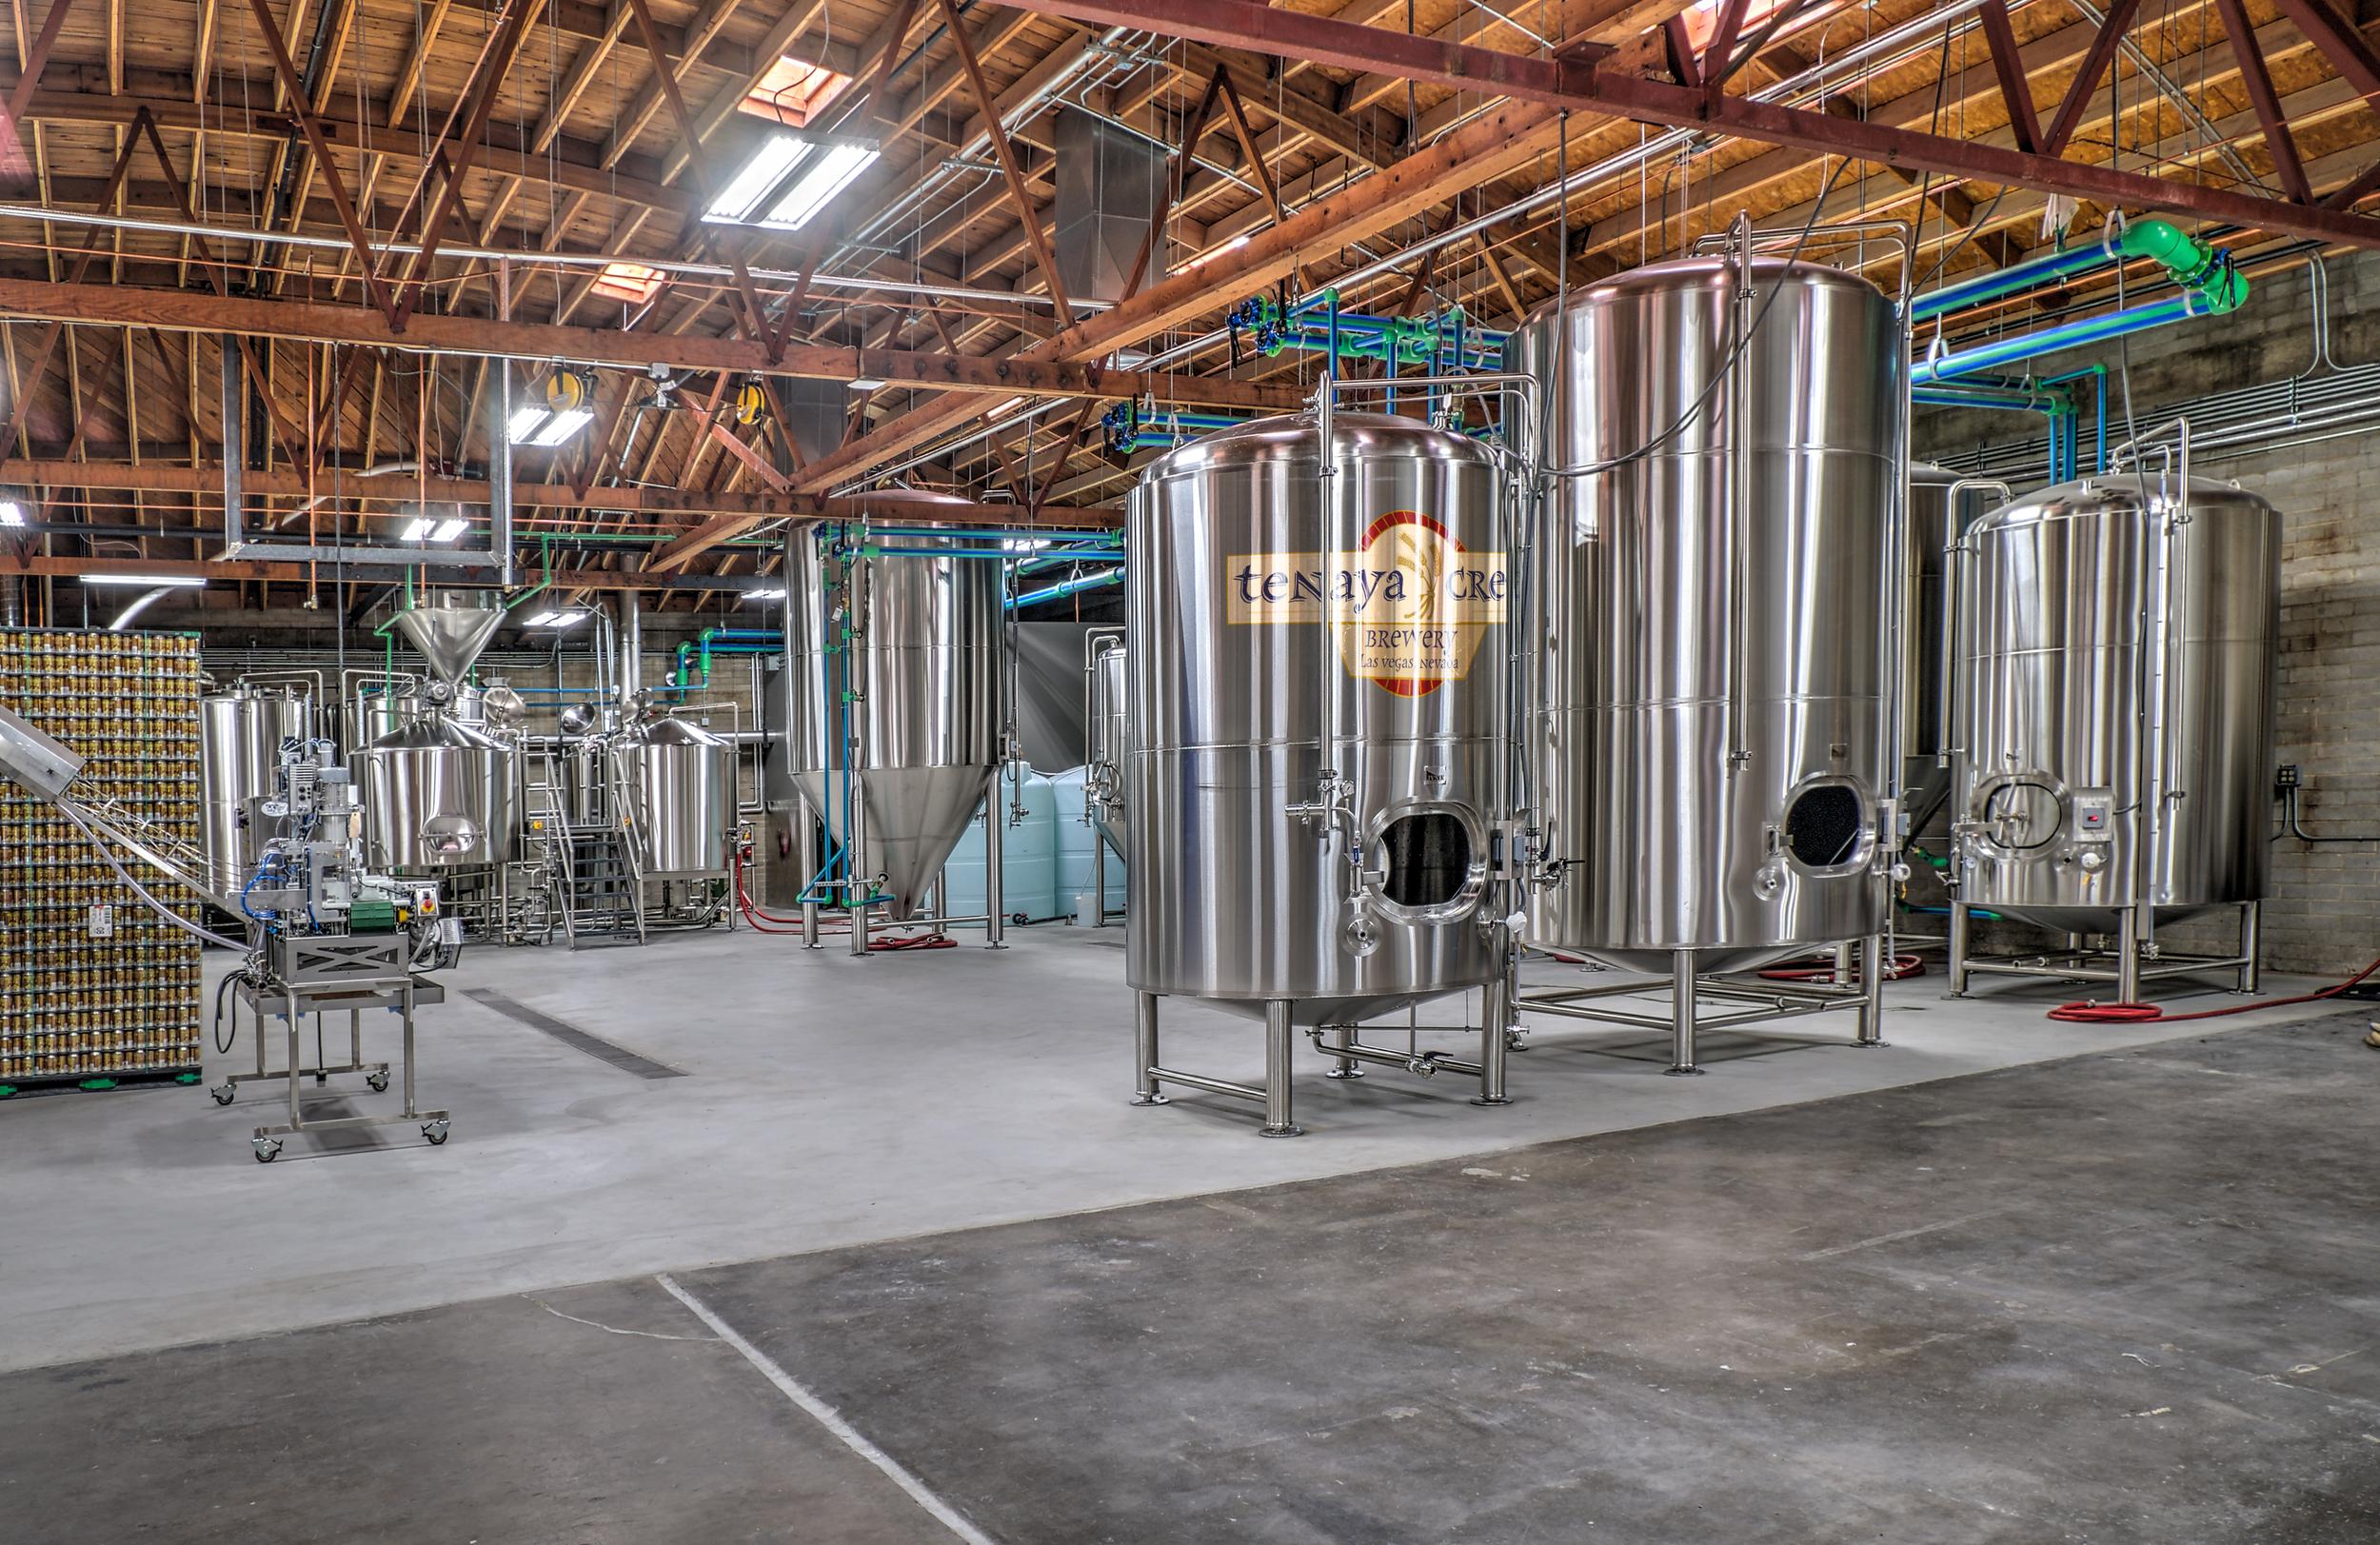 breweryfacility_Wlogo.jpg